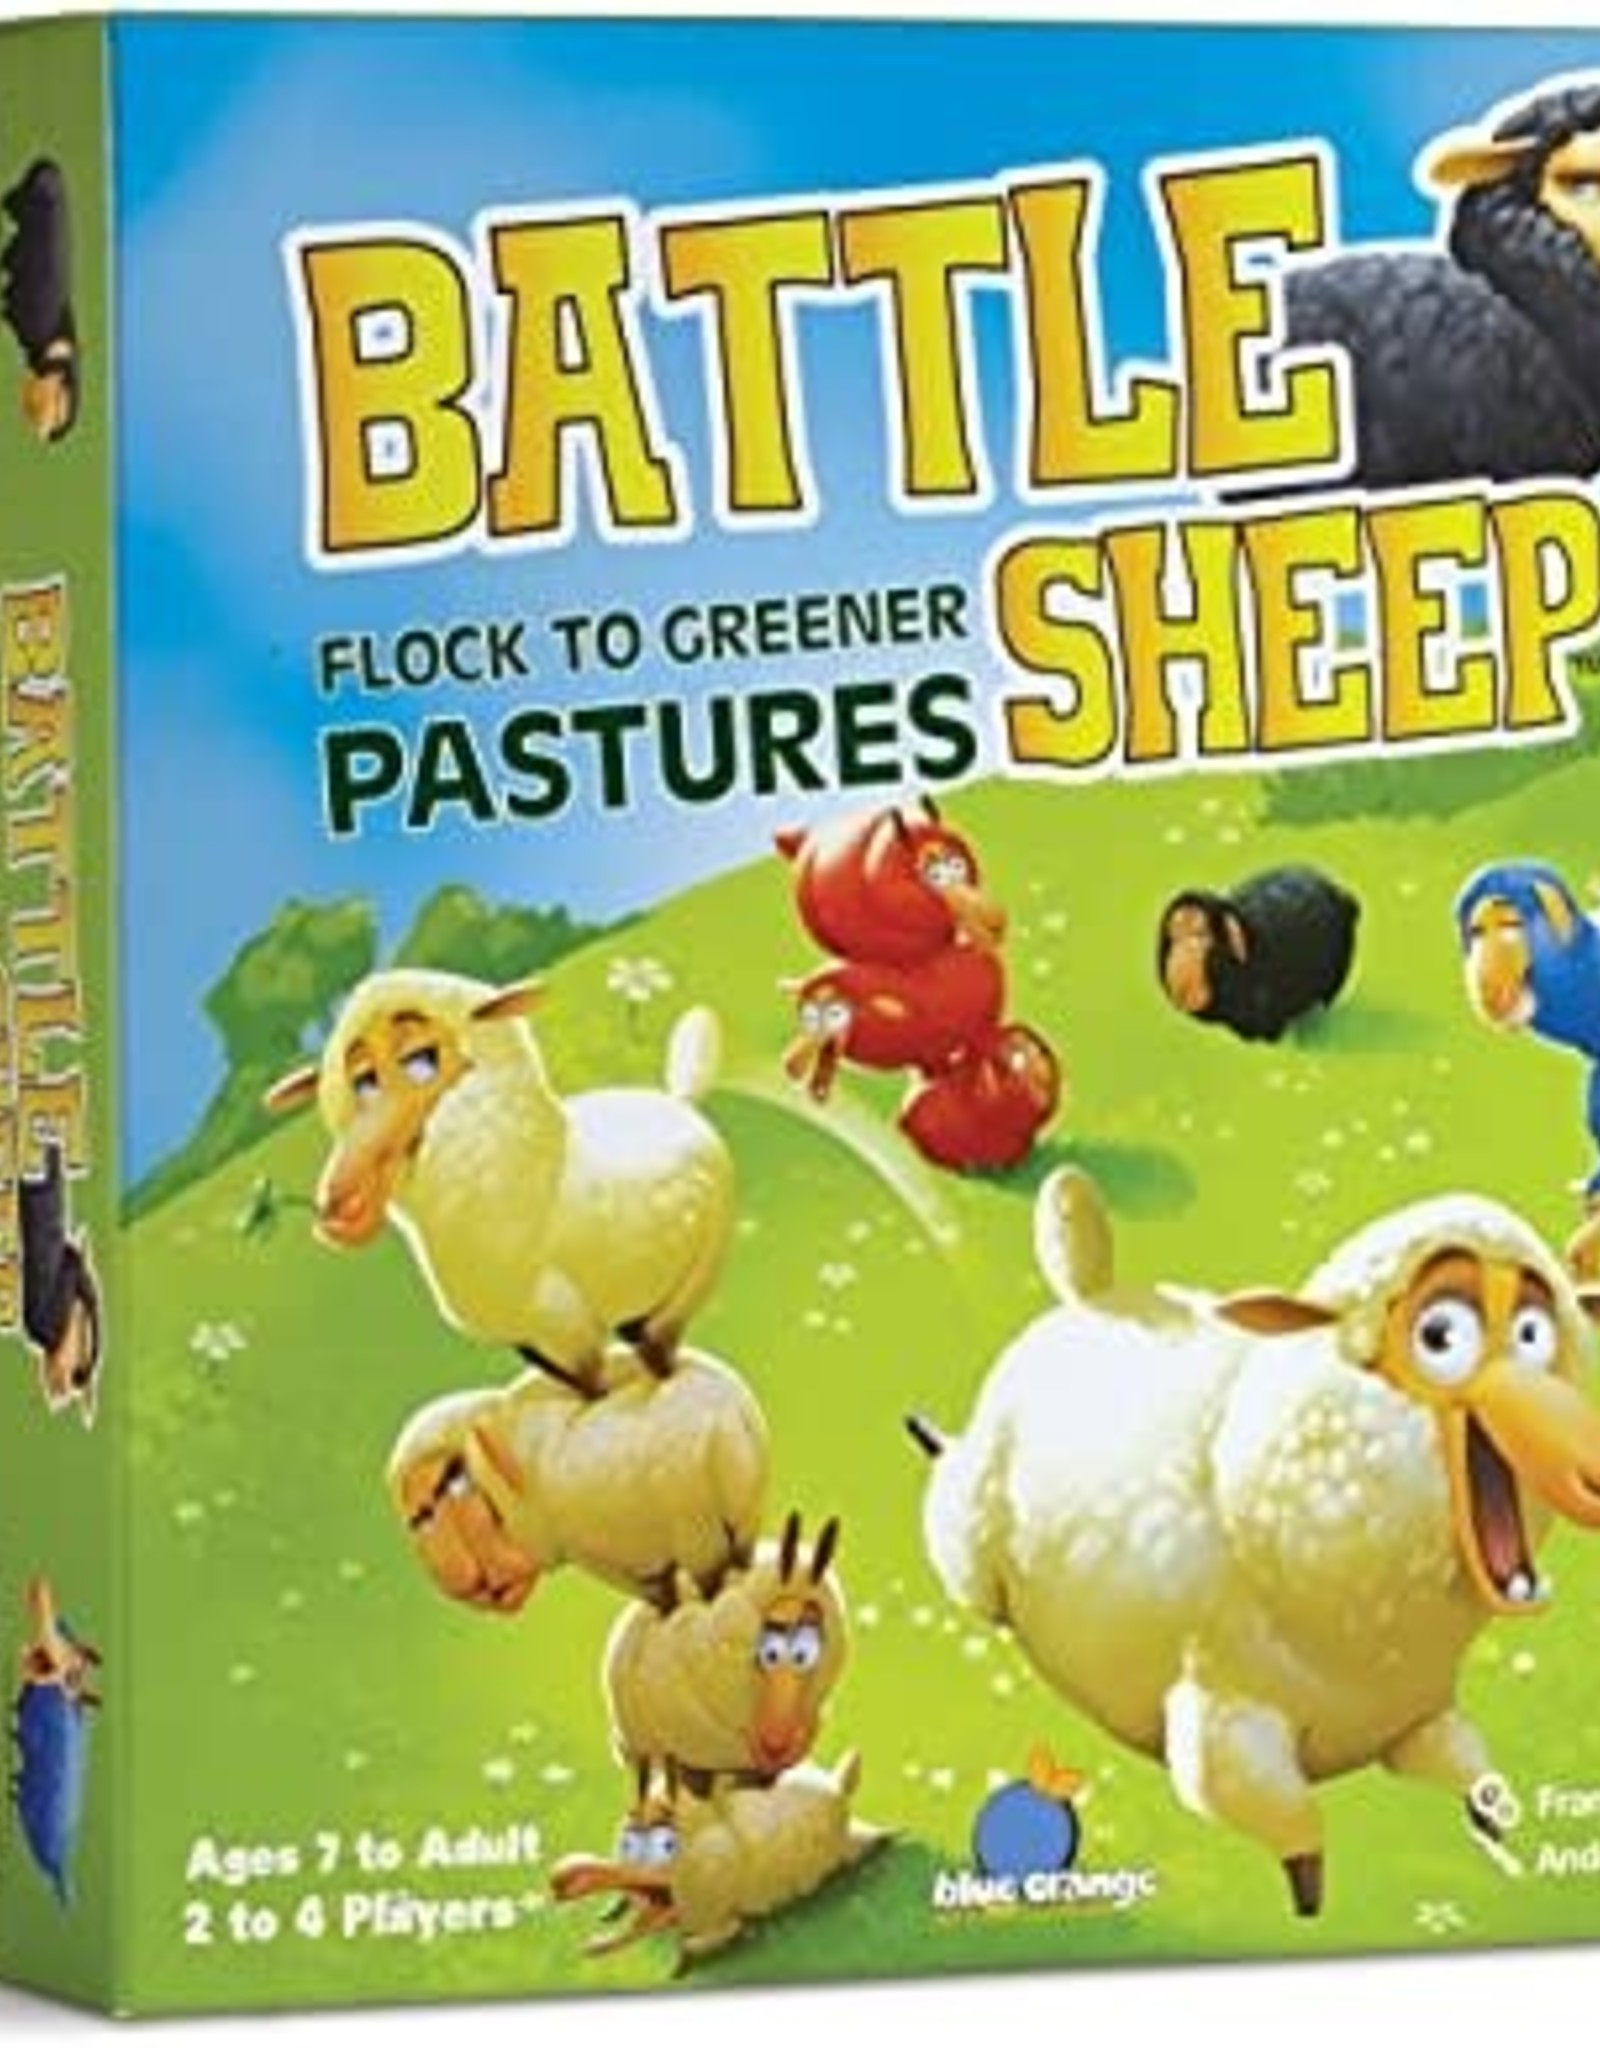 Blue Orange Battle Sheep